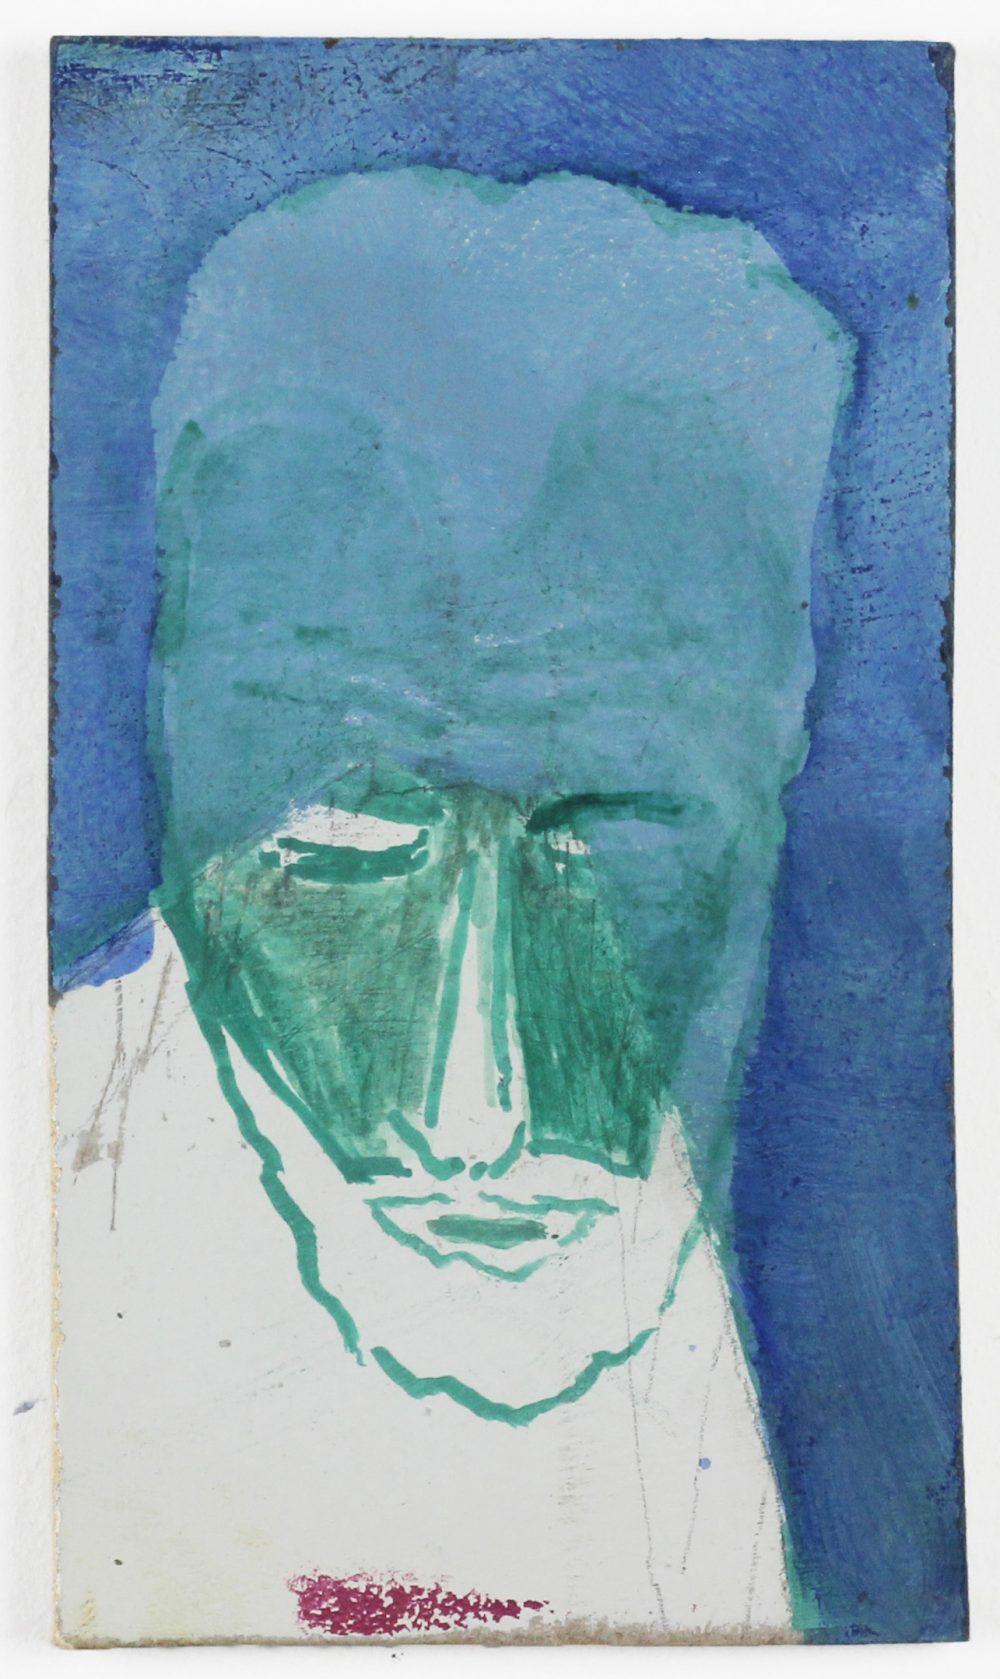 Isaac Jordan, Untitled (Dark Star) (2020) oil on board, 11.5 x 9cm